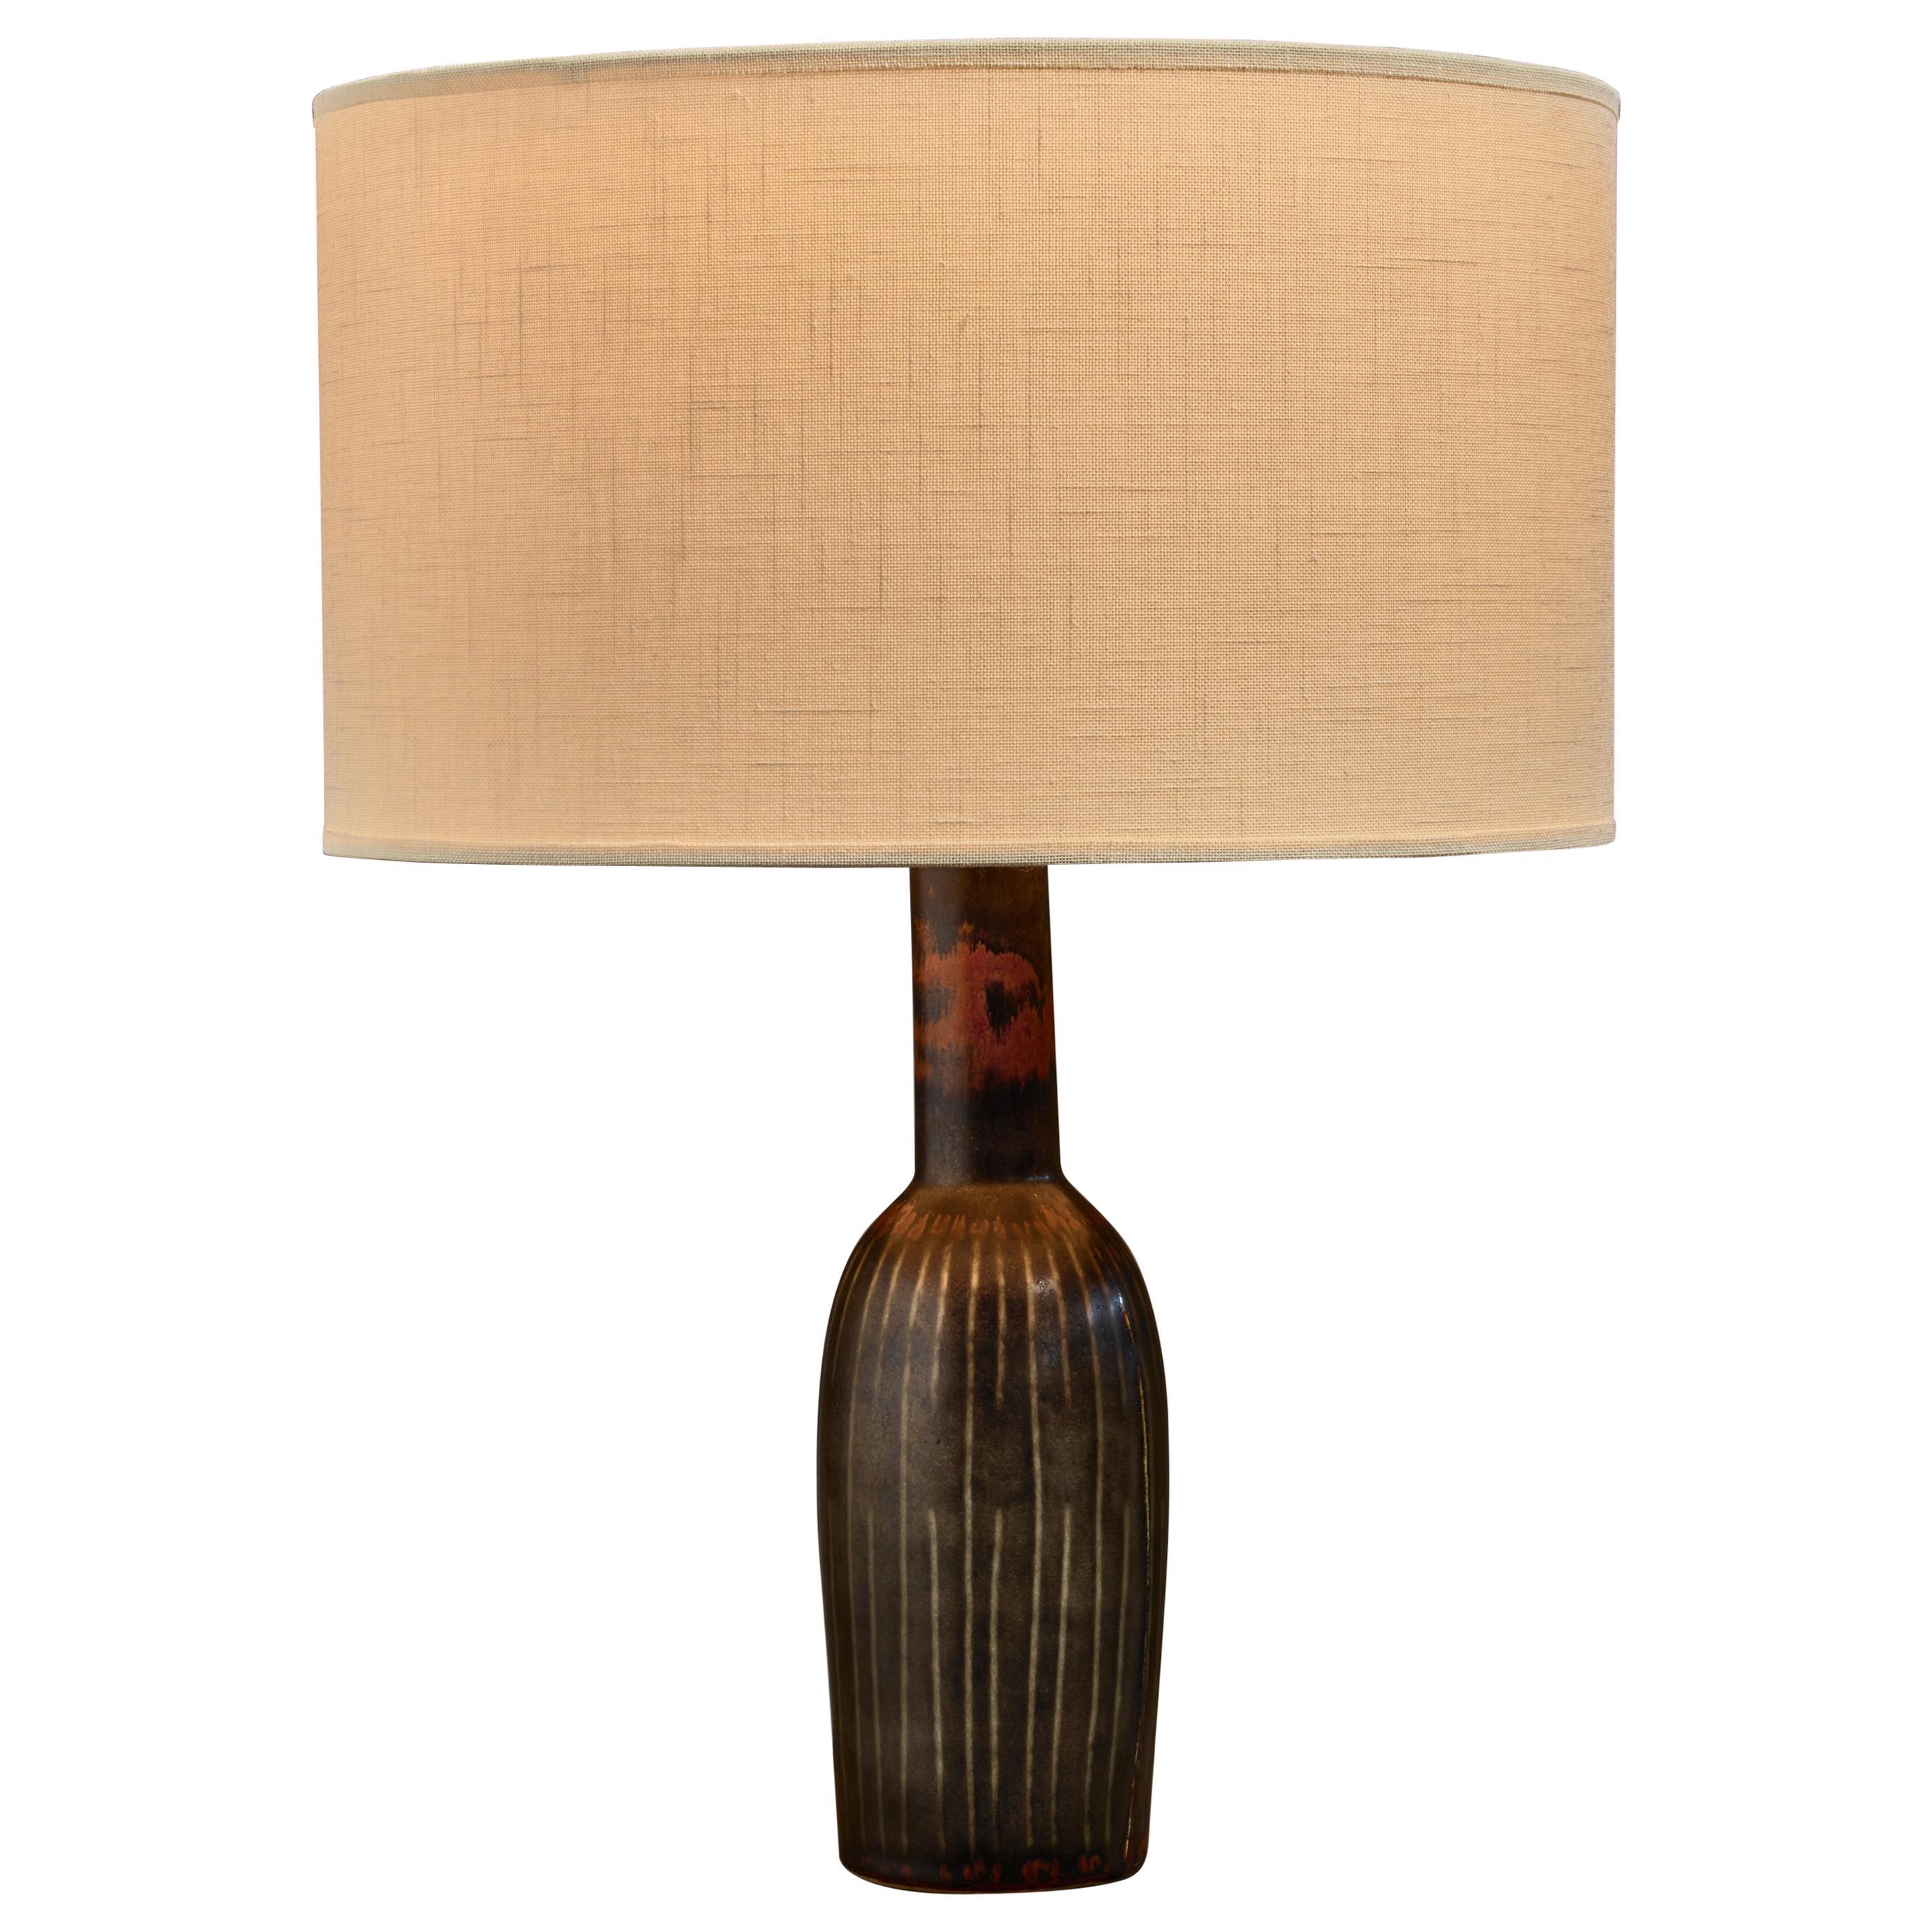 Carl-Harry Stålhane Ceramic Table Lamp